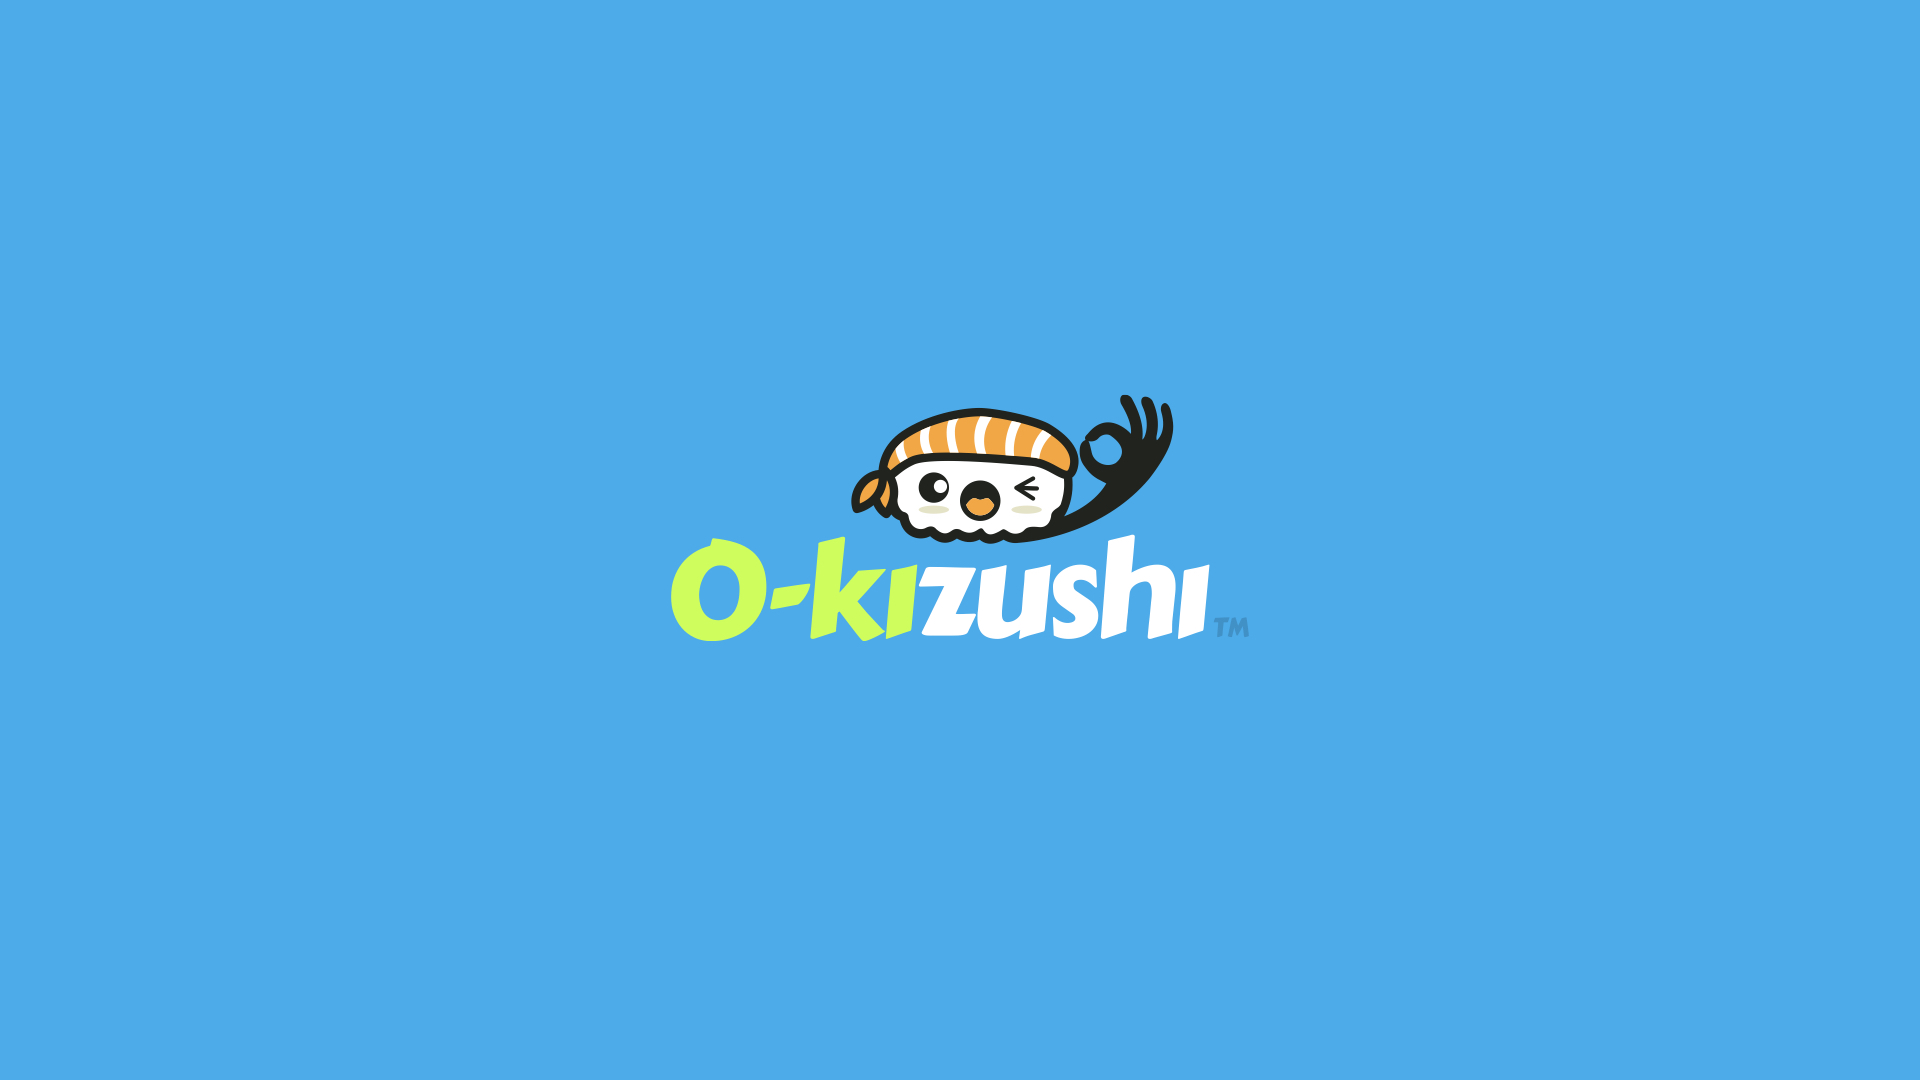 o-kizushi-proposal-generic01.001.jpeg